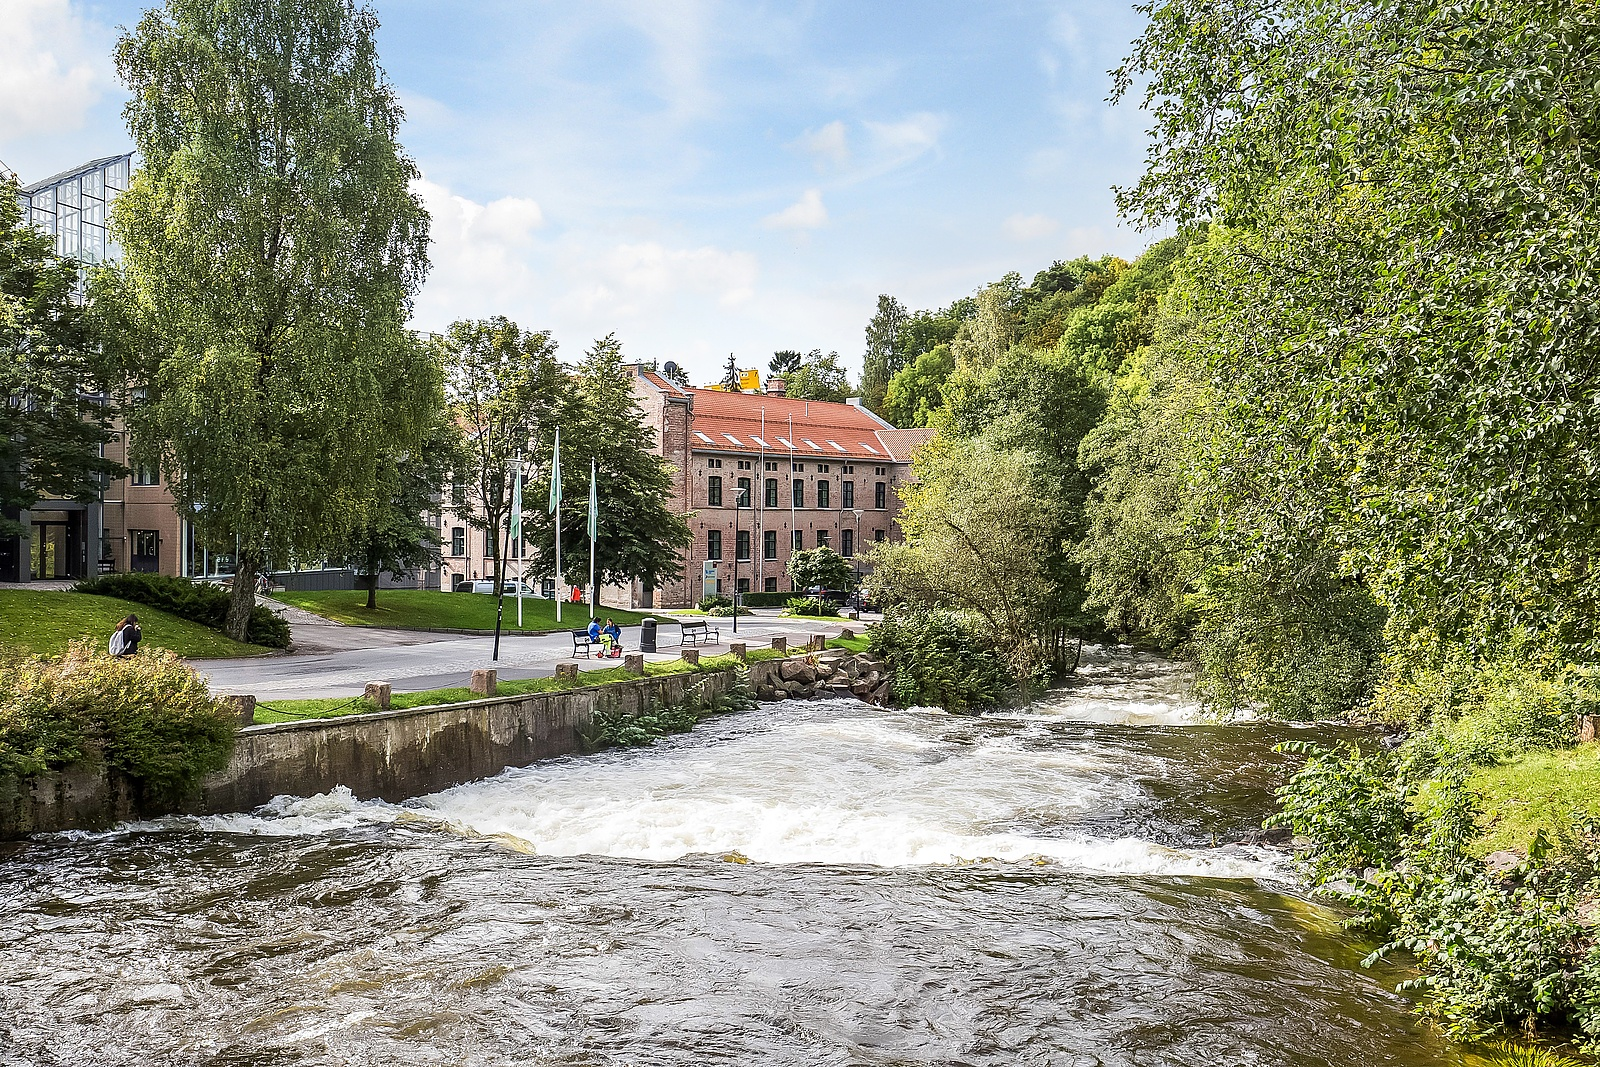 Zivid HQ in Nydalen, Oslo, Norway